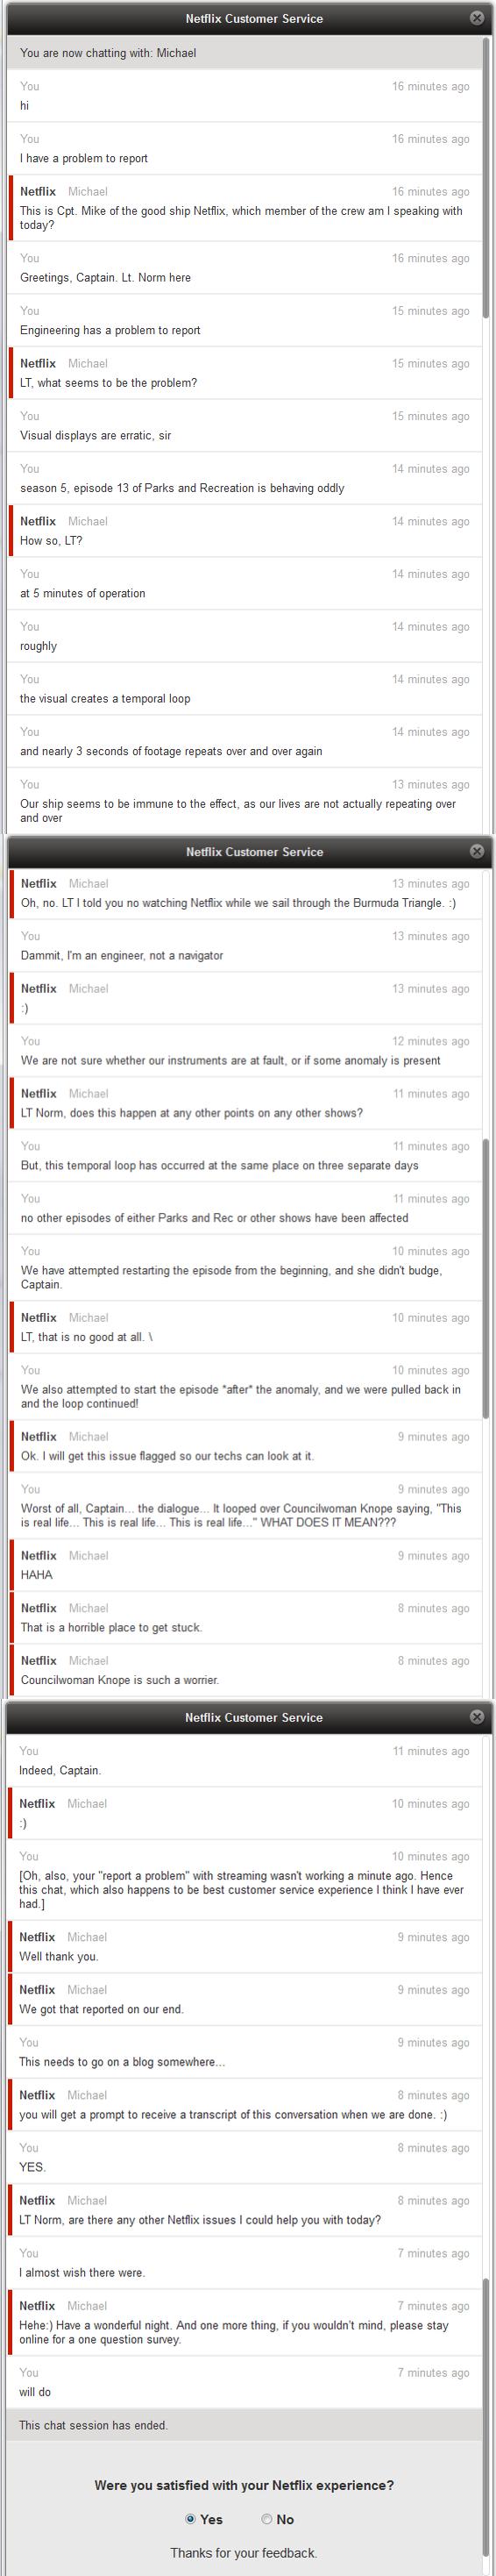 netflix chat support